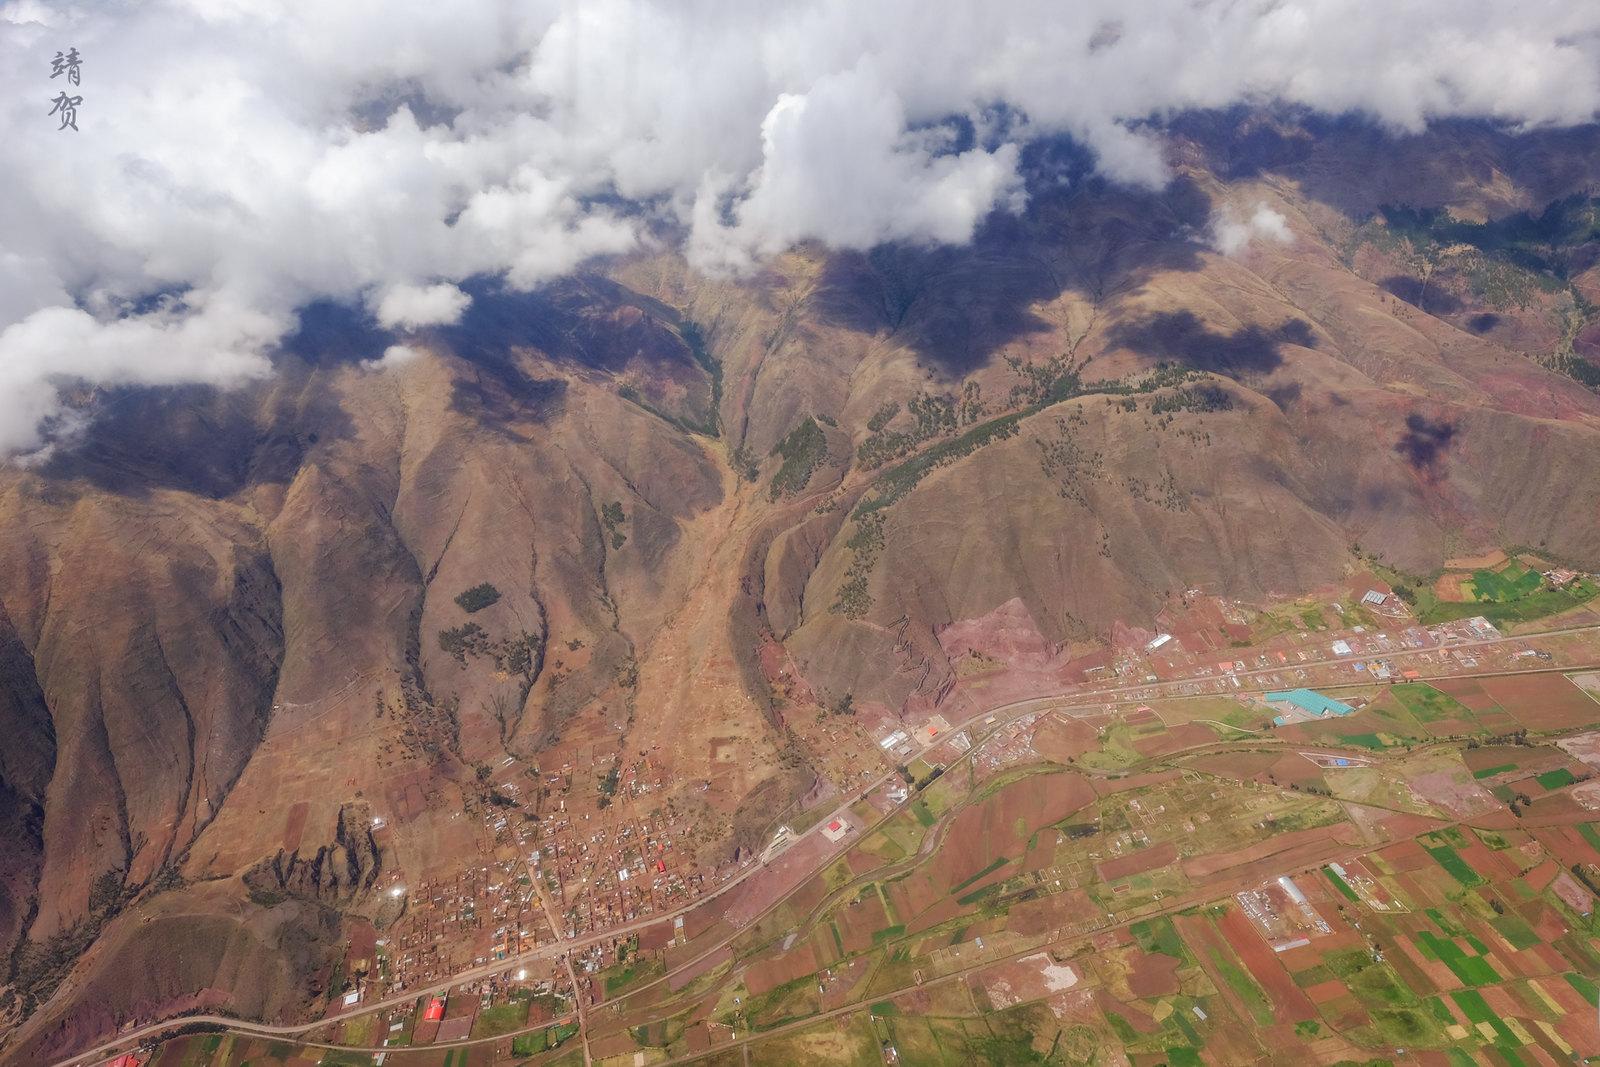 Town of Choquepata